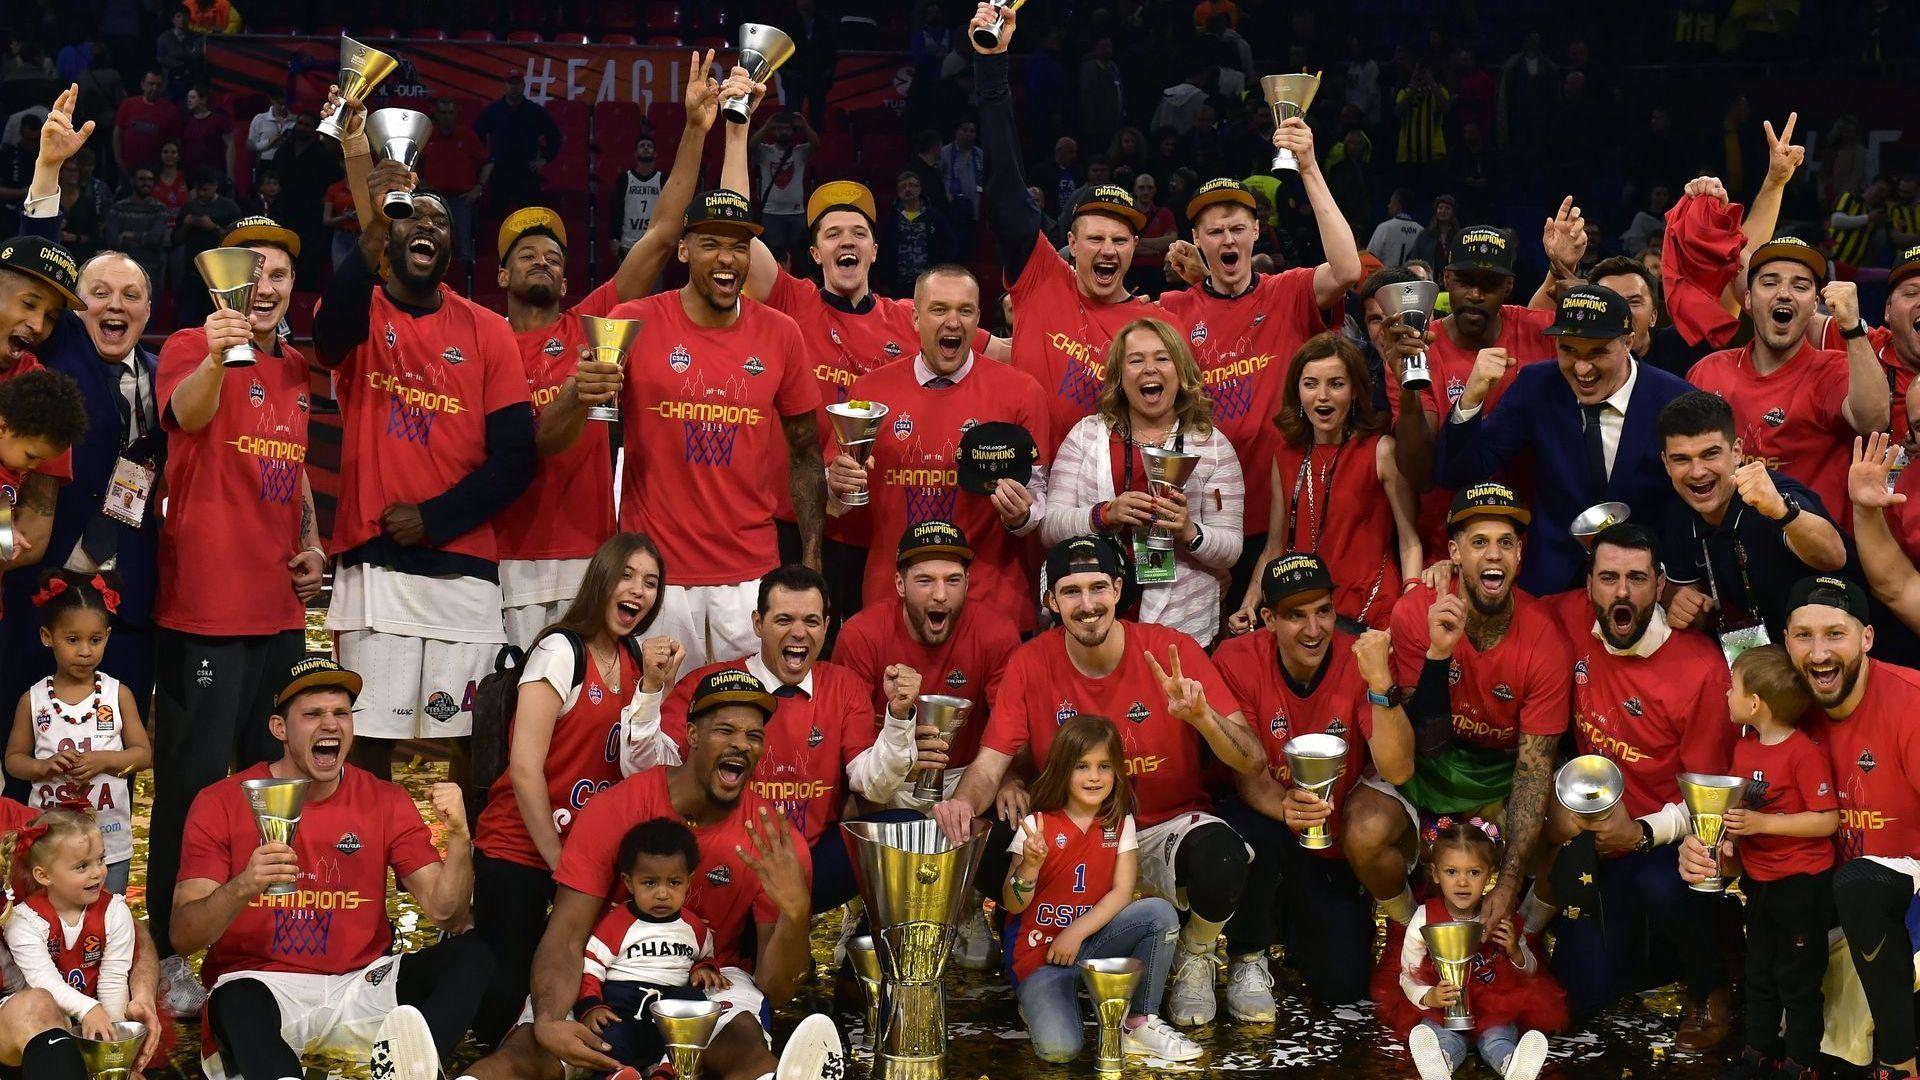 ЦСКА е новият шампион на Европа